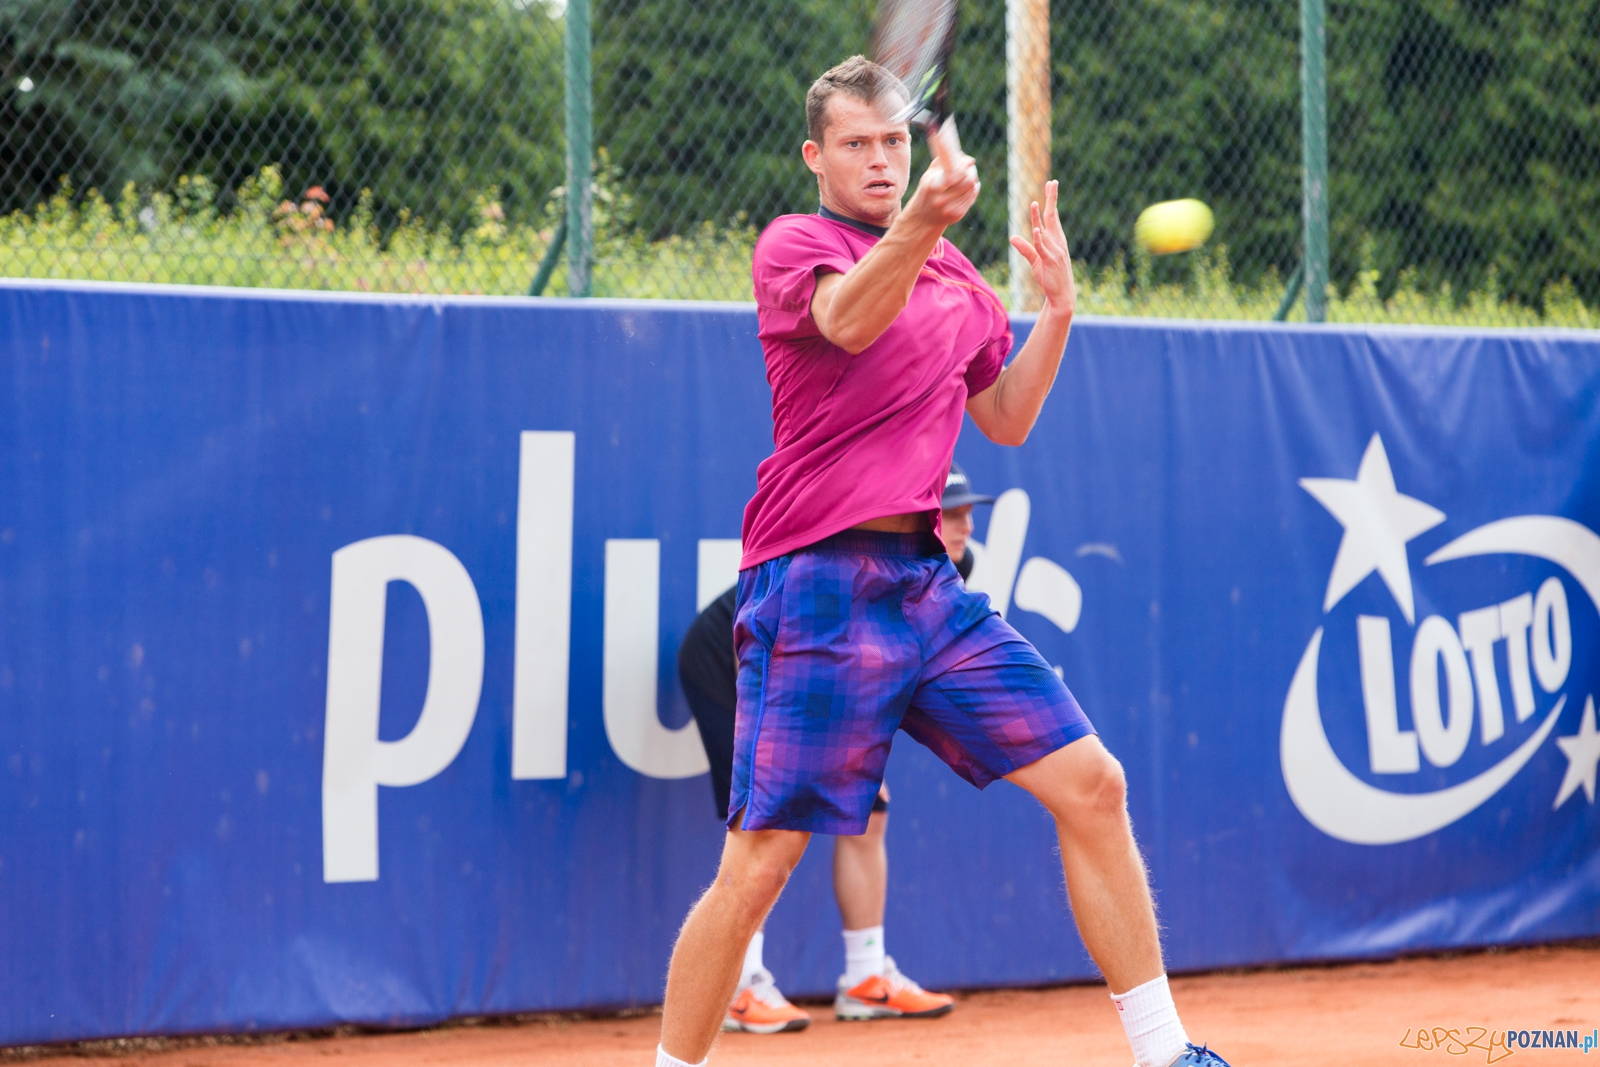 Poznan Open 2015 - Tristan Lamasine - Adam Pavlasek  Foto: lepszyPOZNAN.pl / Piotr Rychter